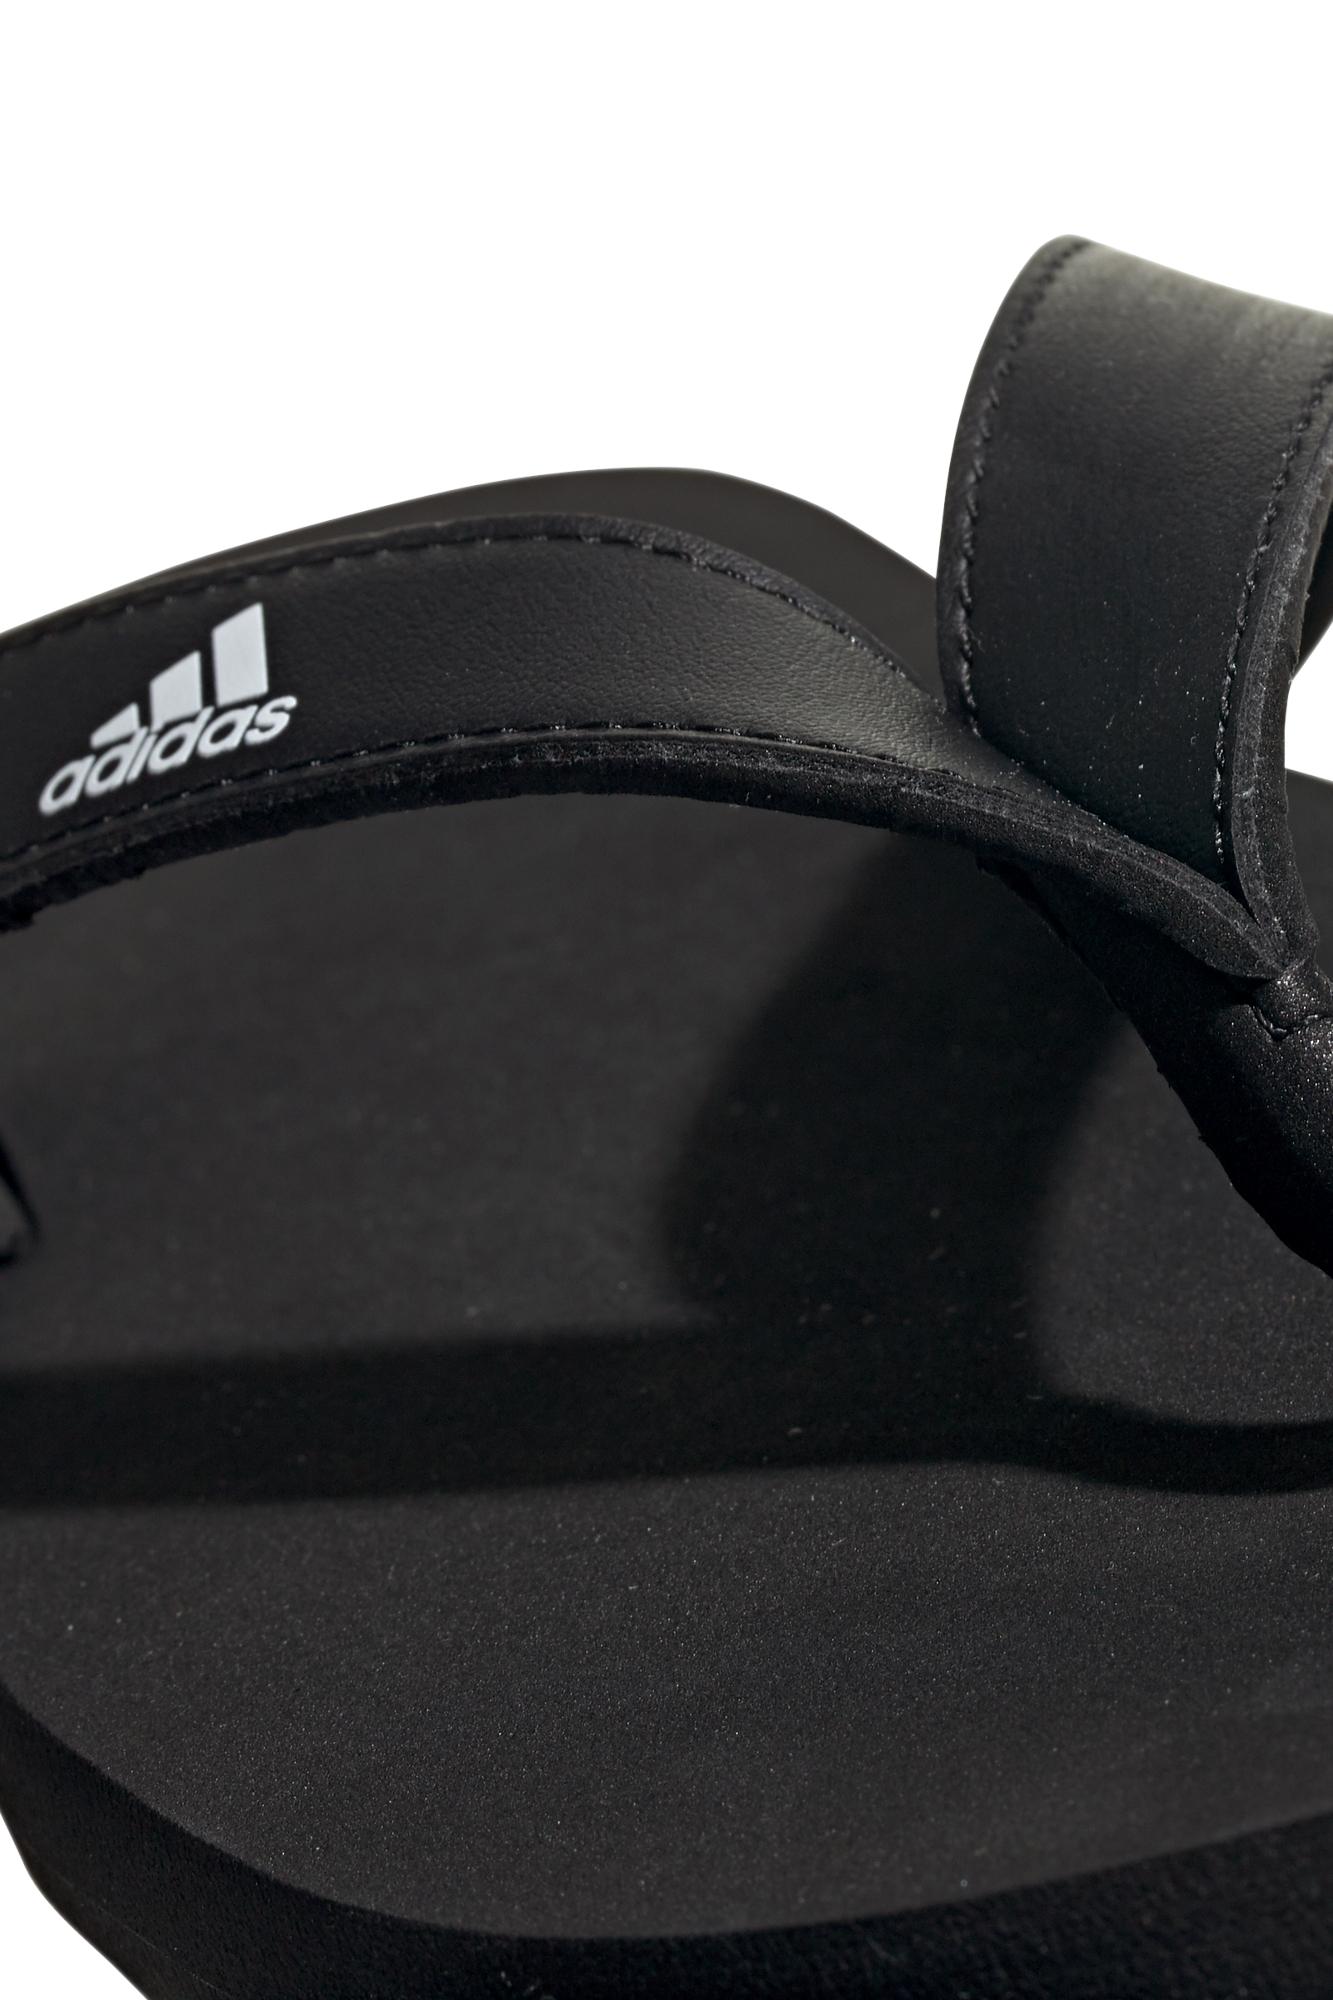 cc448b251bde2 Klapki adidas Eezay Flip-Flops - F35029 / Klapki / Buty / Męskie ...